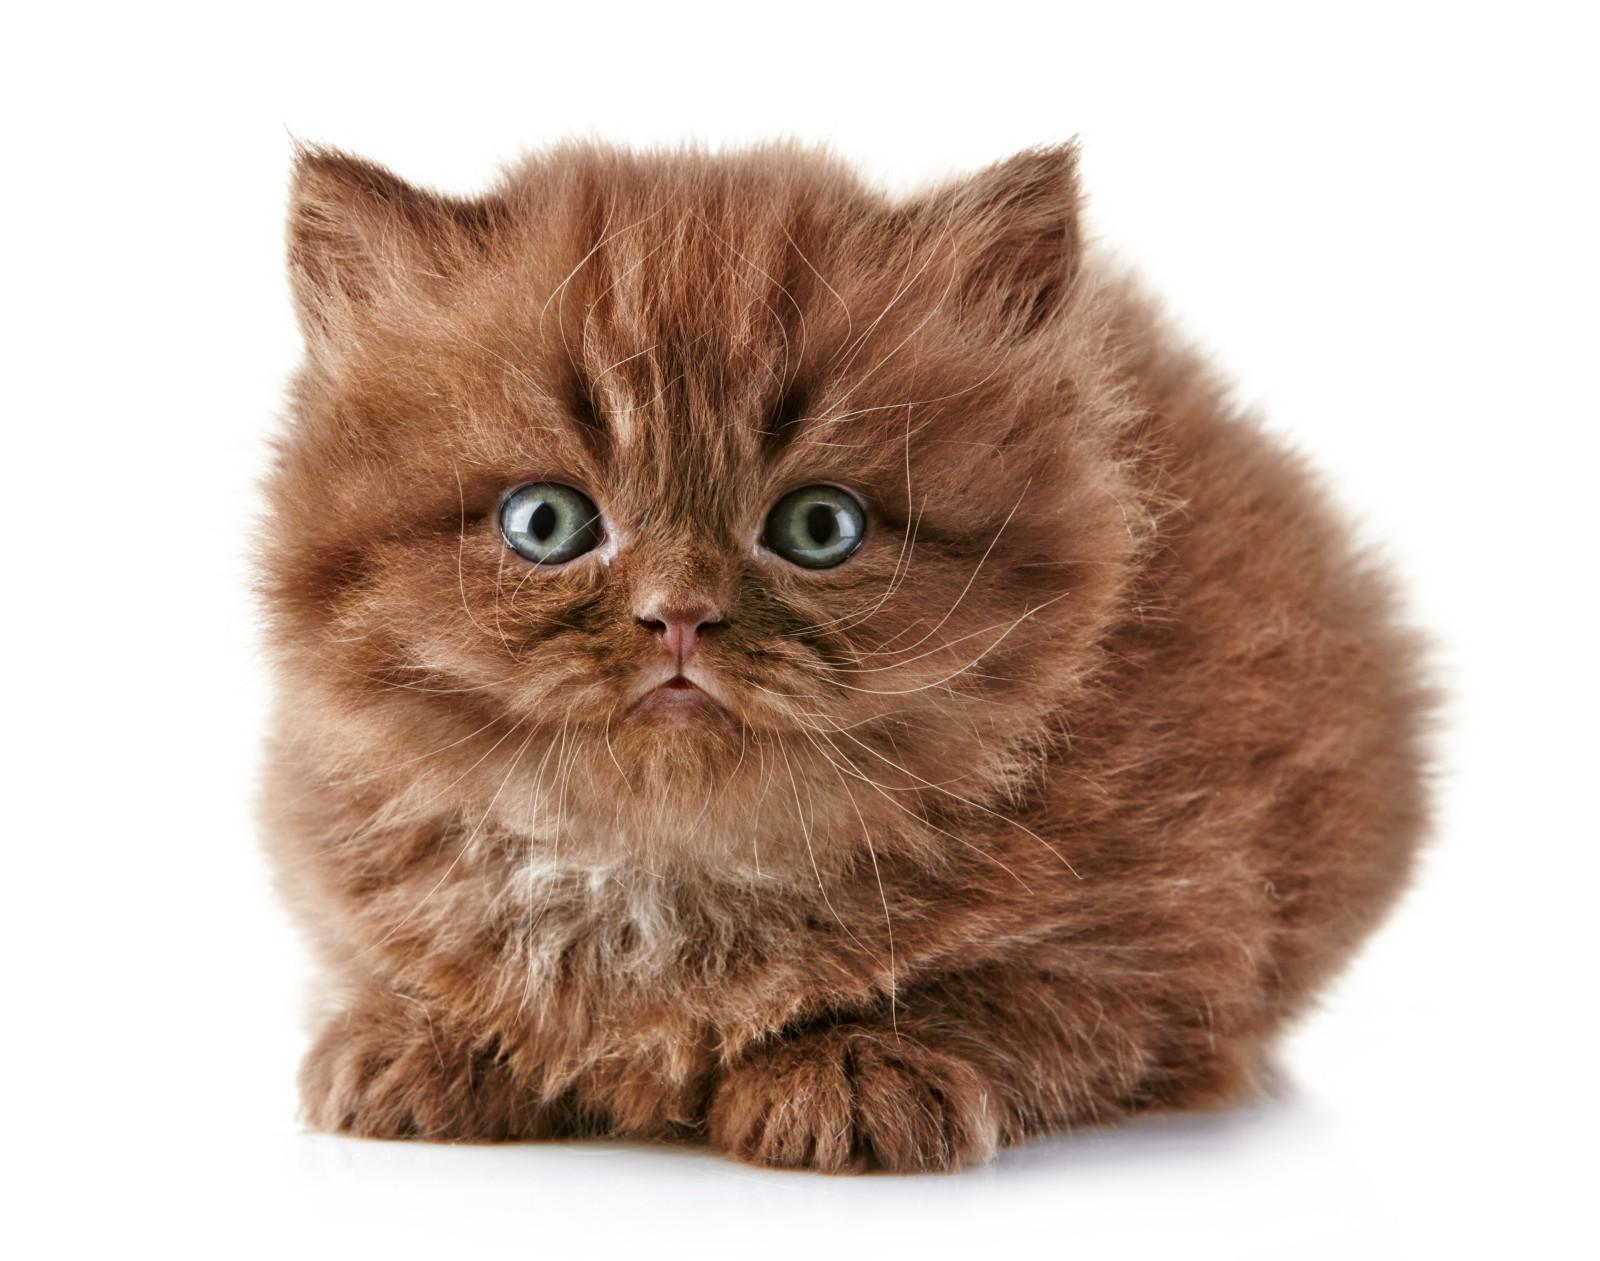 British Semi-longhair Kitten: British Beautiful British Longhair Kitten Breed